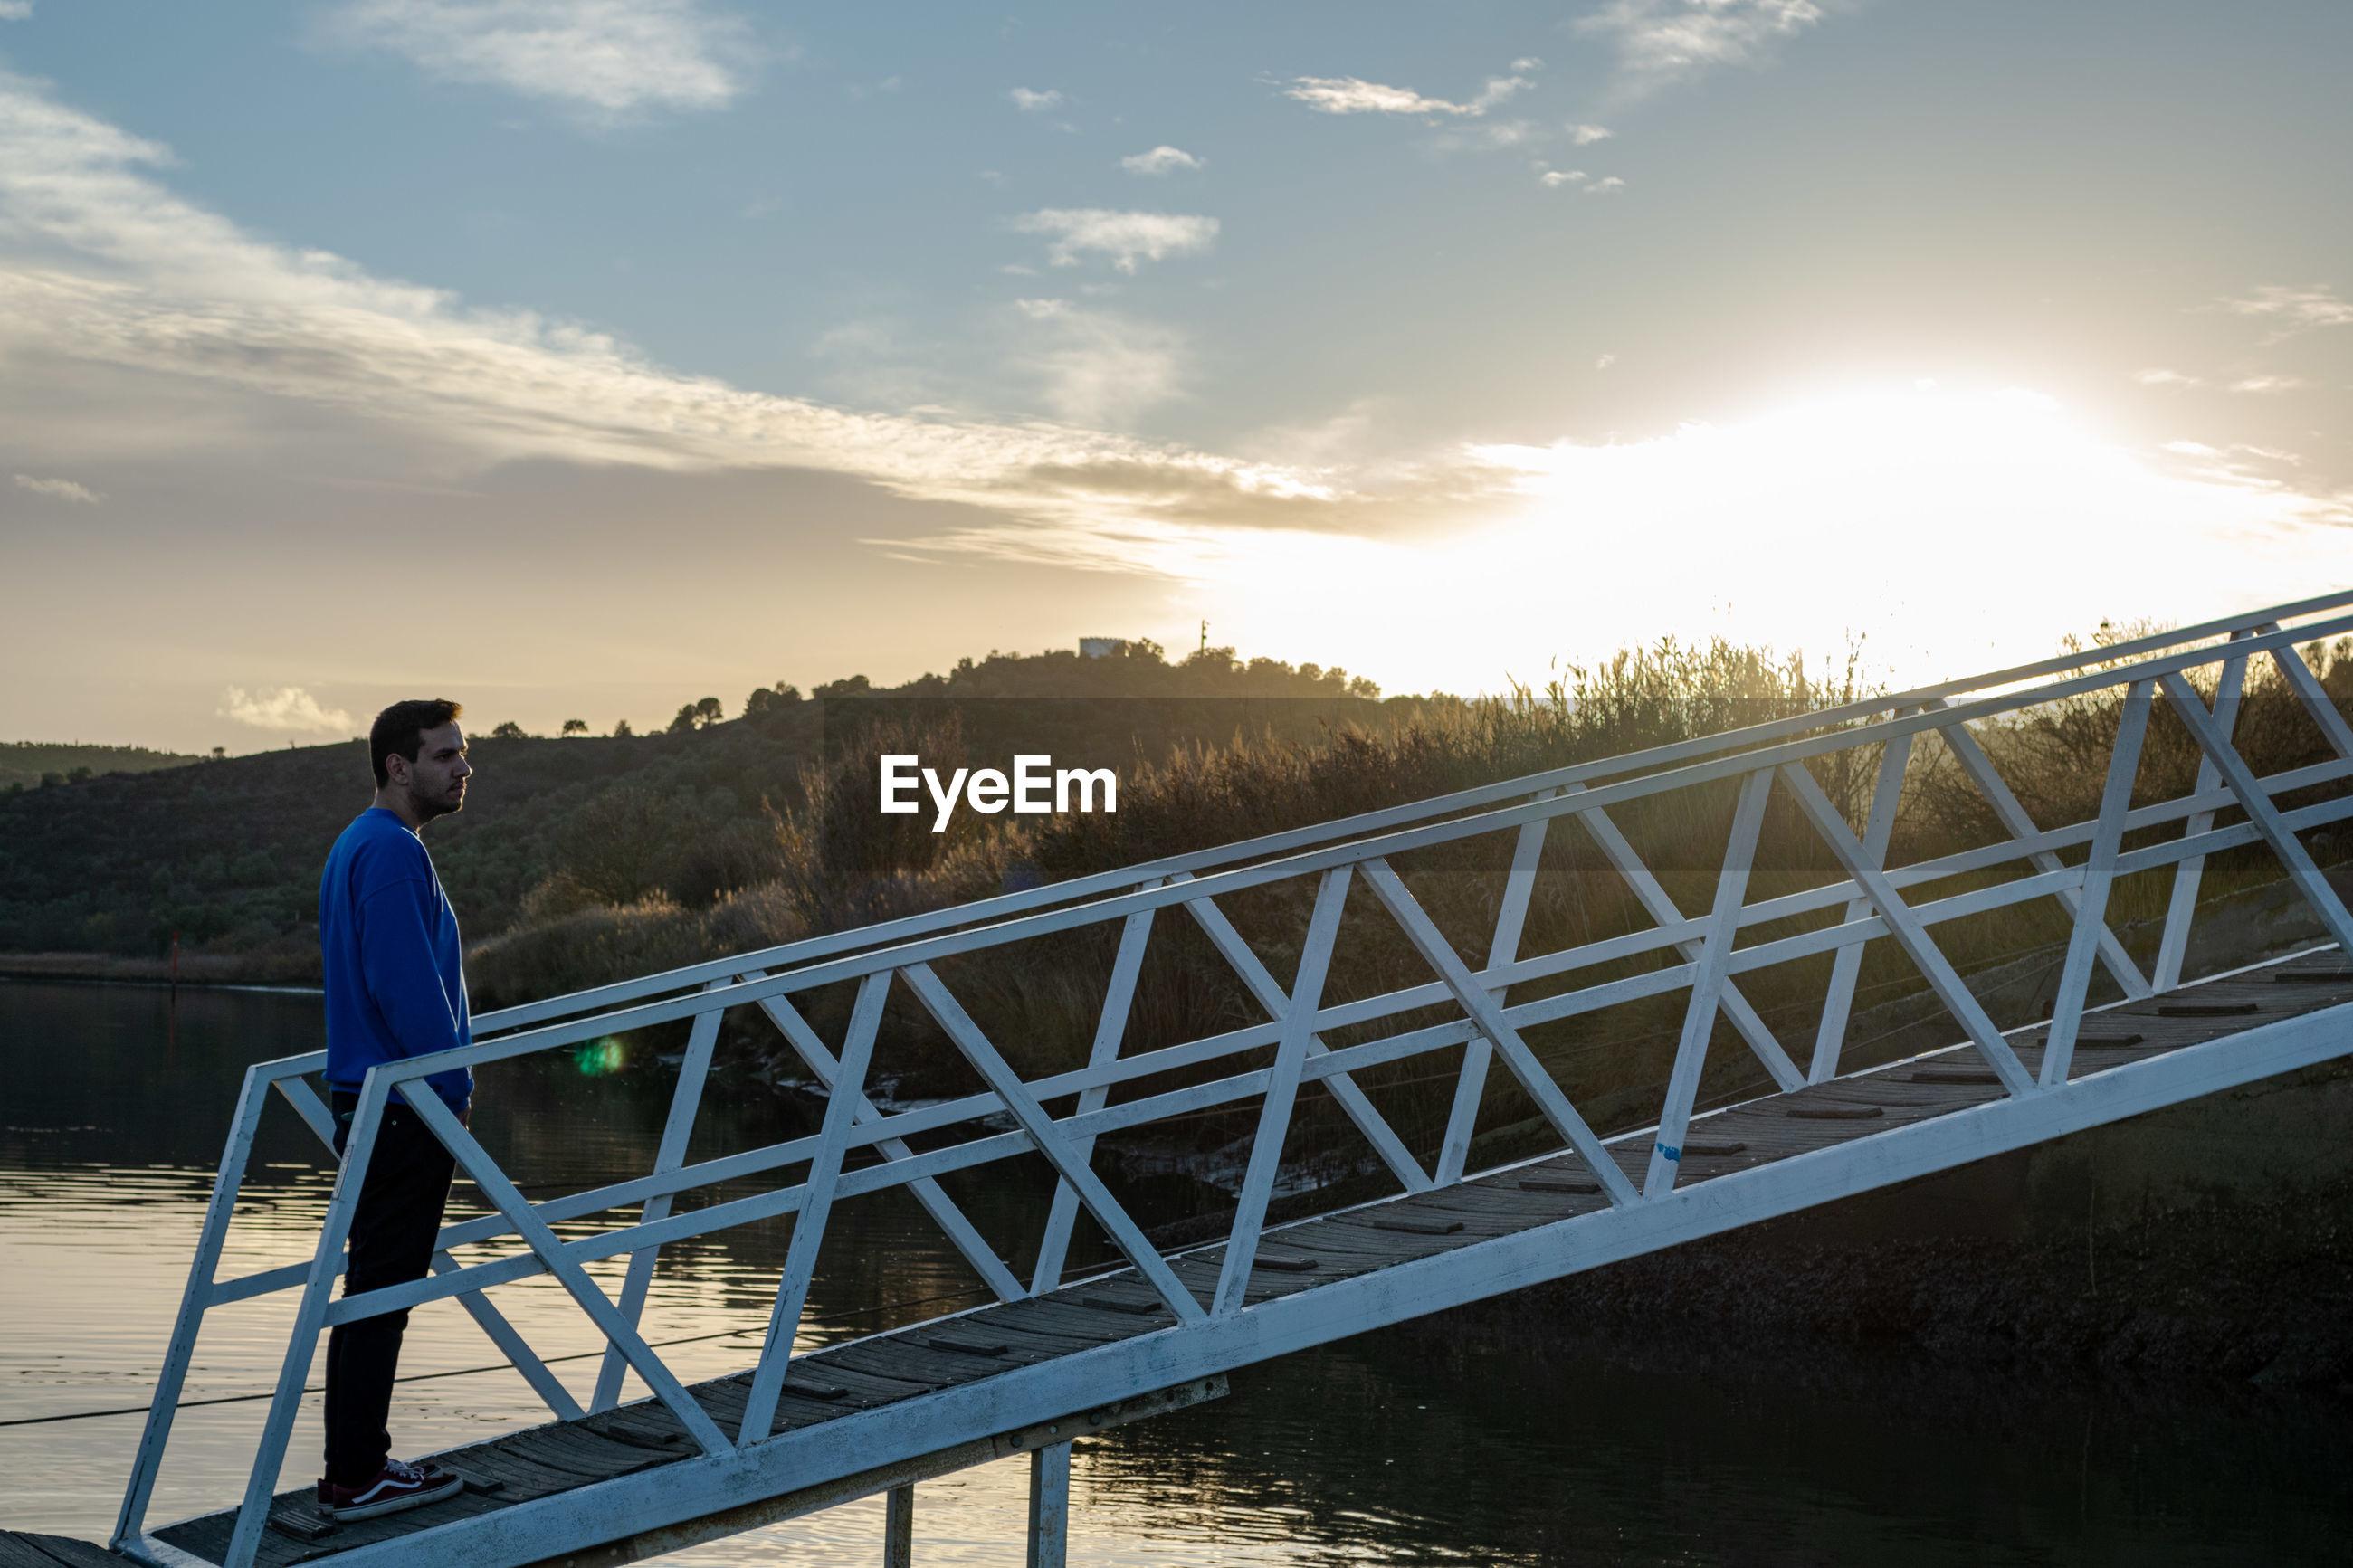 Man standing on bridge against sky during sunset